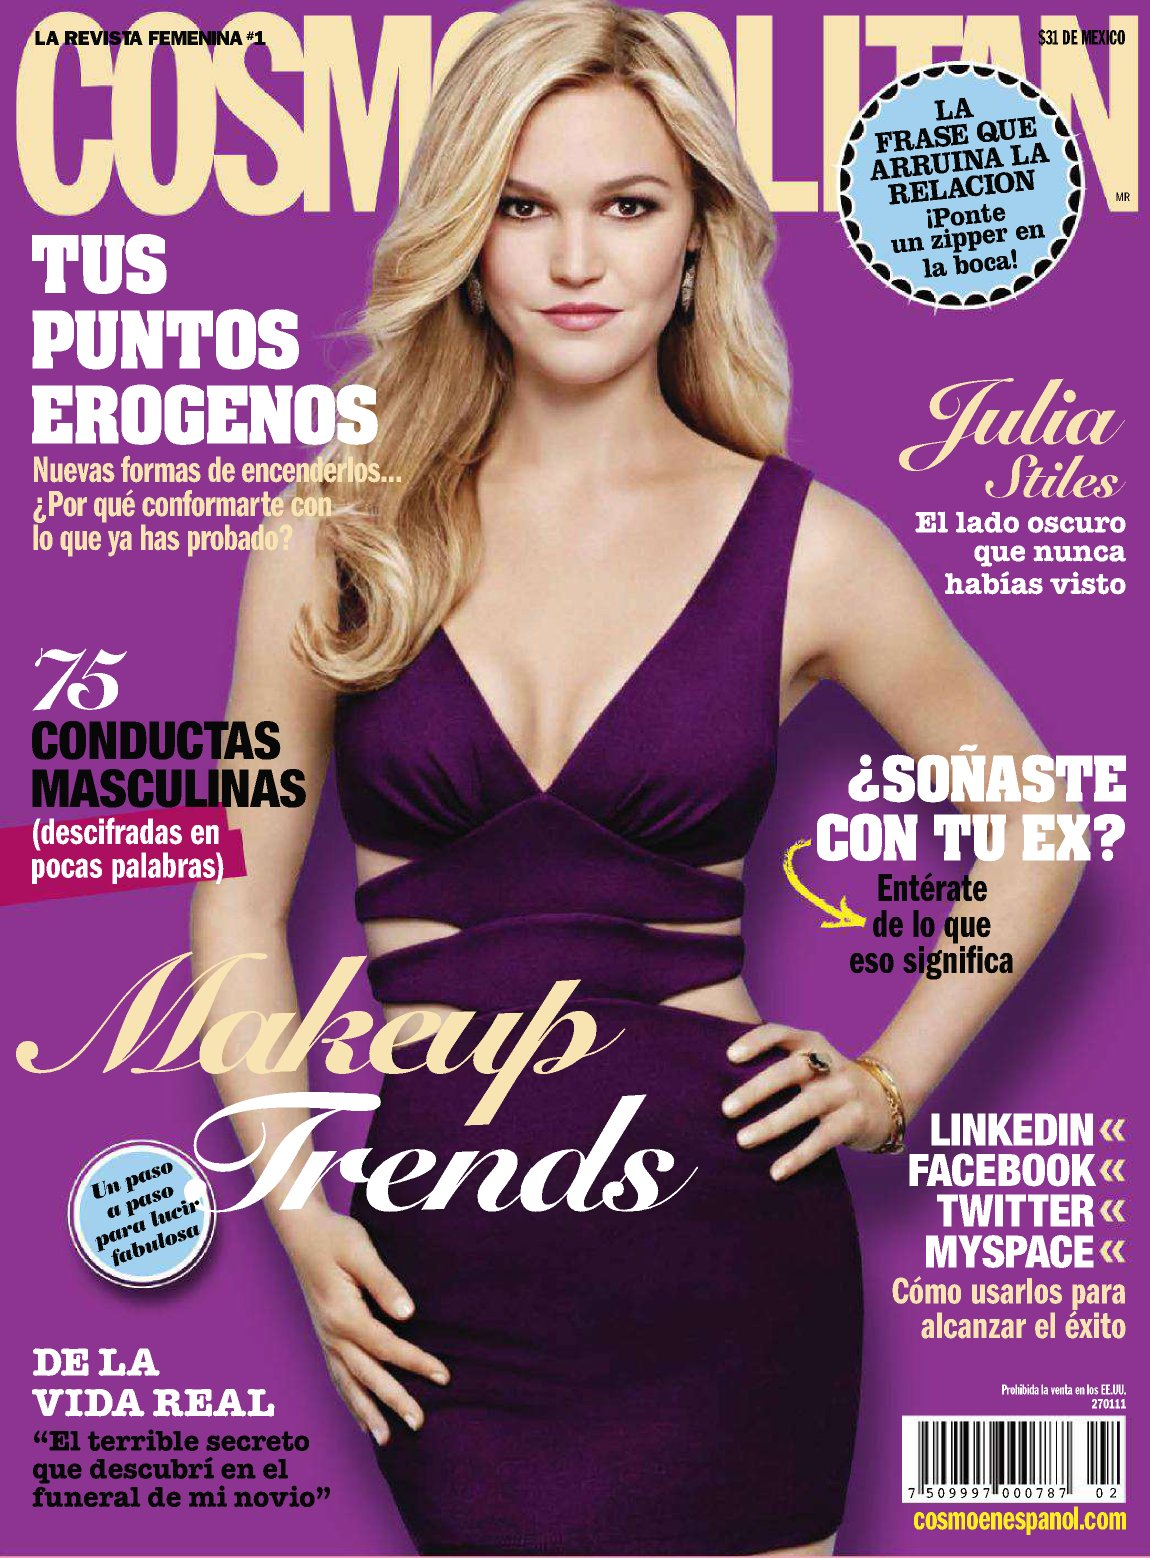 http://3.bp.blogspot.com/_s5f7btuhJwk/TTs8BQRa1BI/AAAAAAAABfs/pDyda1LvRKY/s1600/Julia+Stiles+hot+Cosmopolitan+mexico+january+2011.jpg